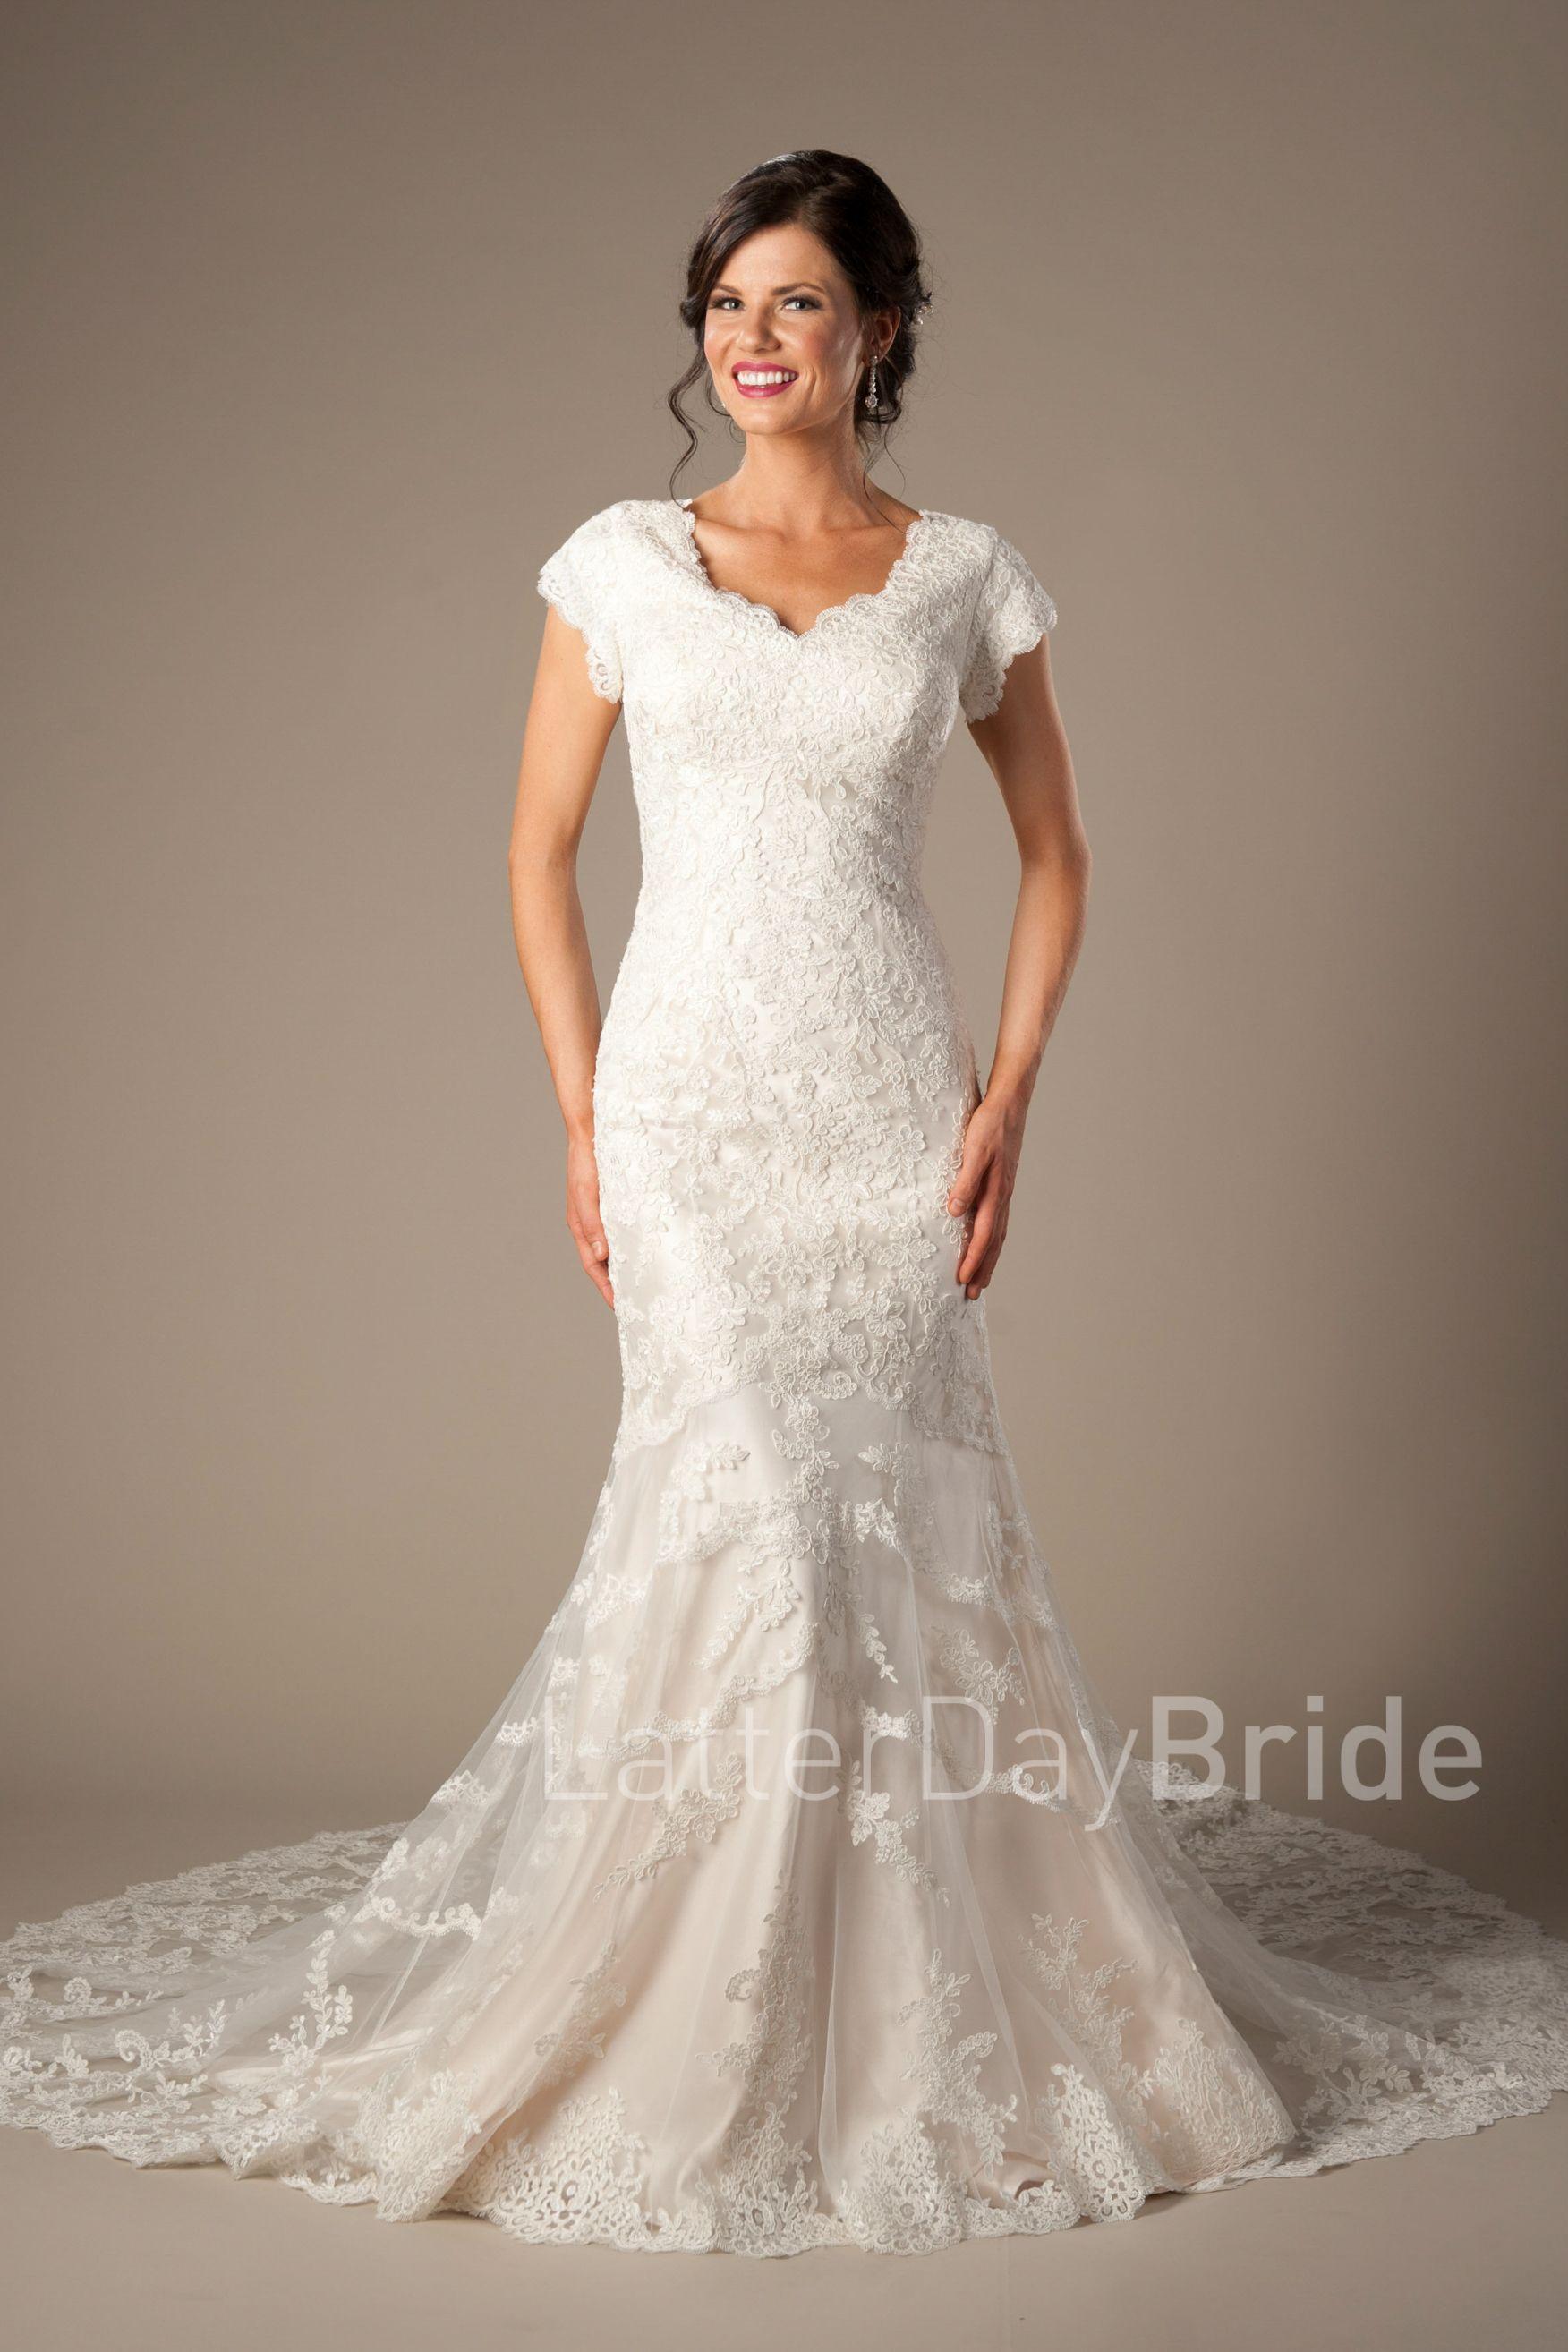 Cheap modest wedding dresses  Modest lds Wedding dress with lace  later day bride  Pinterest